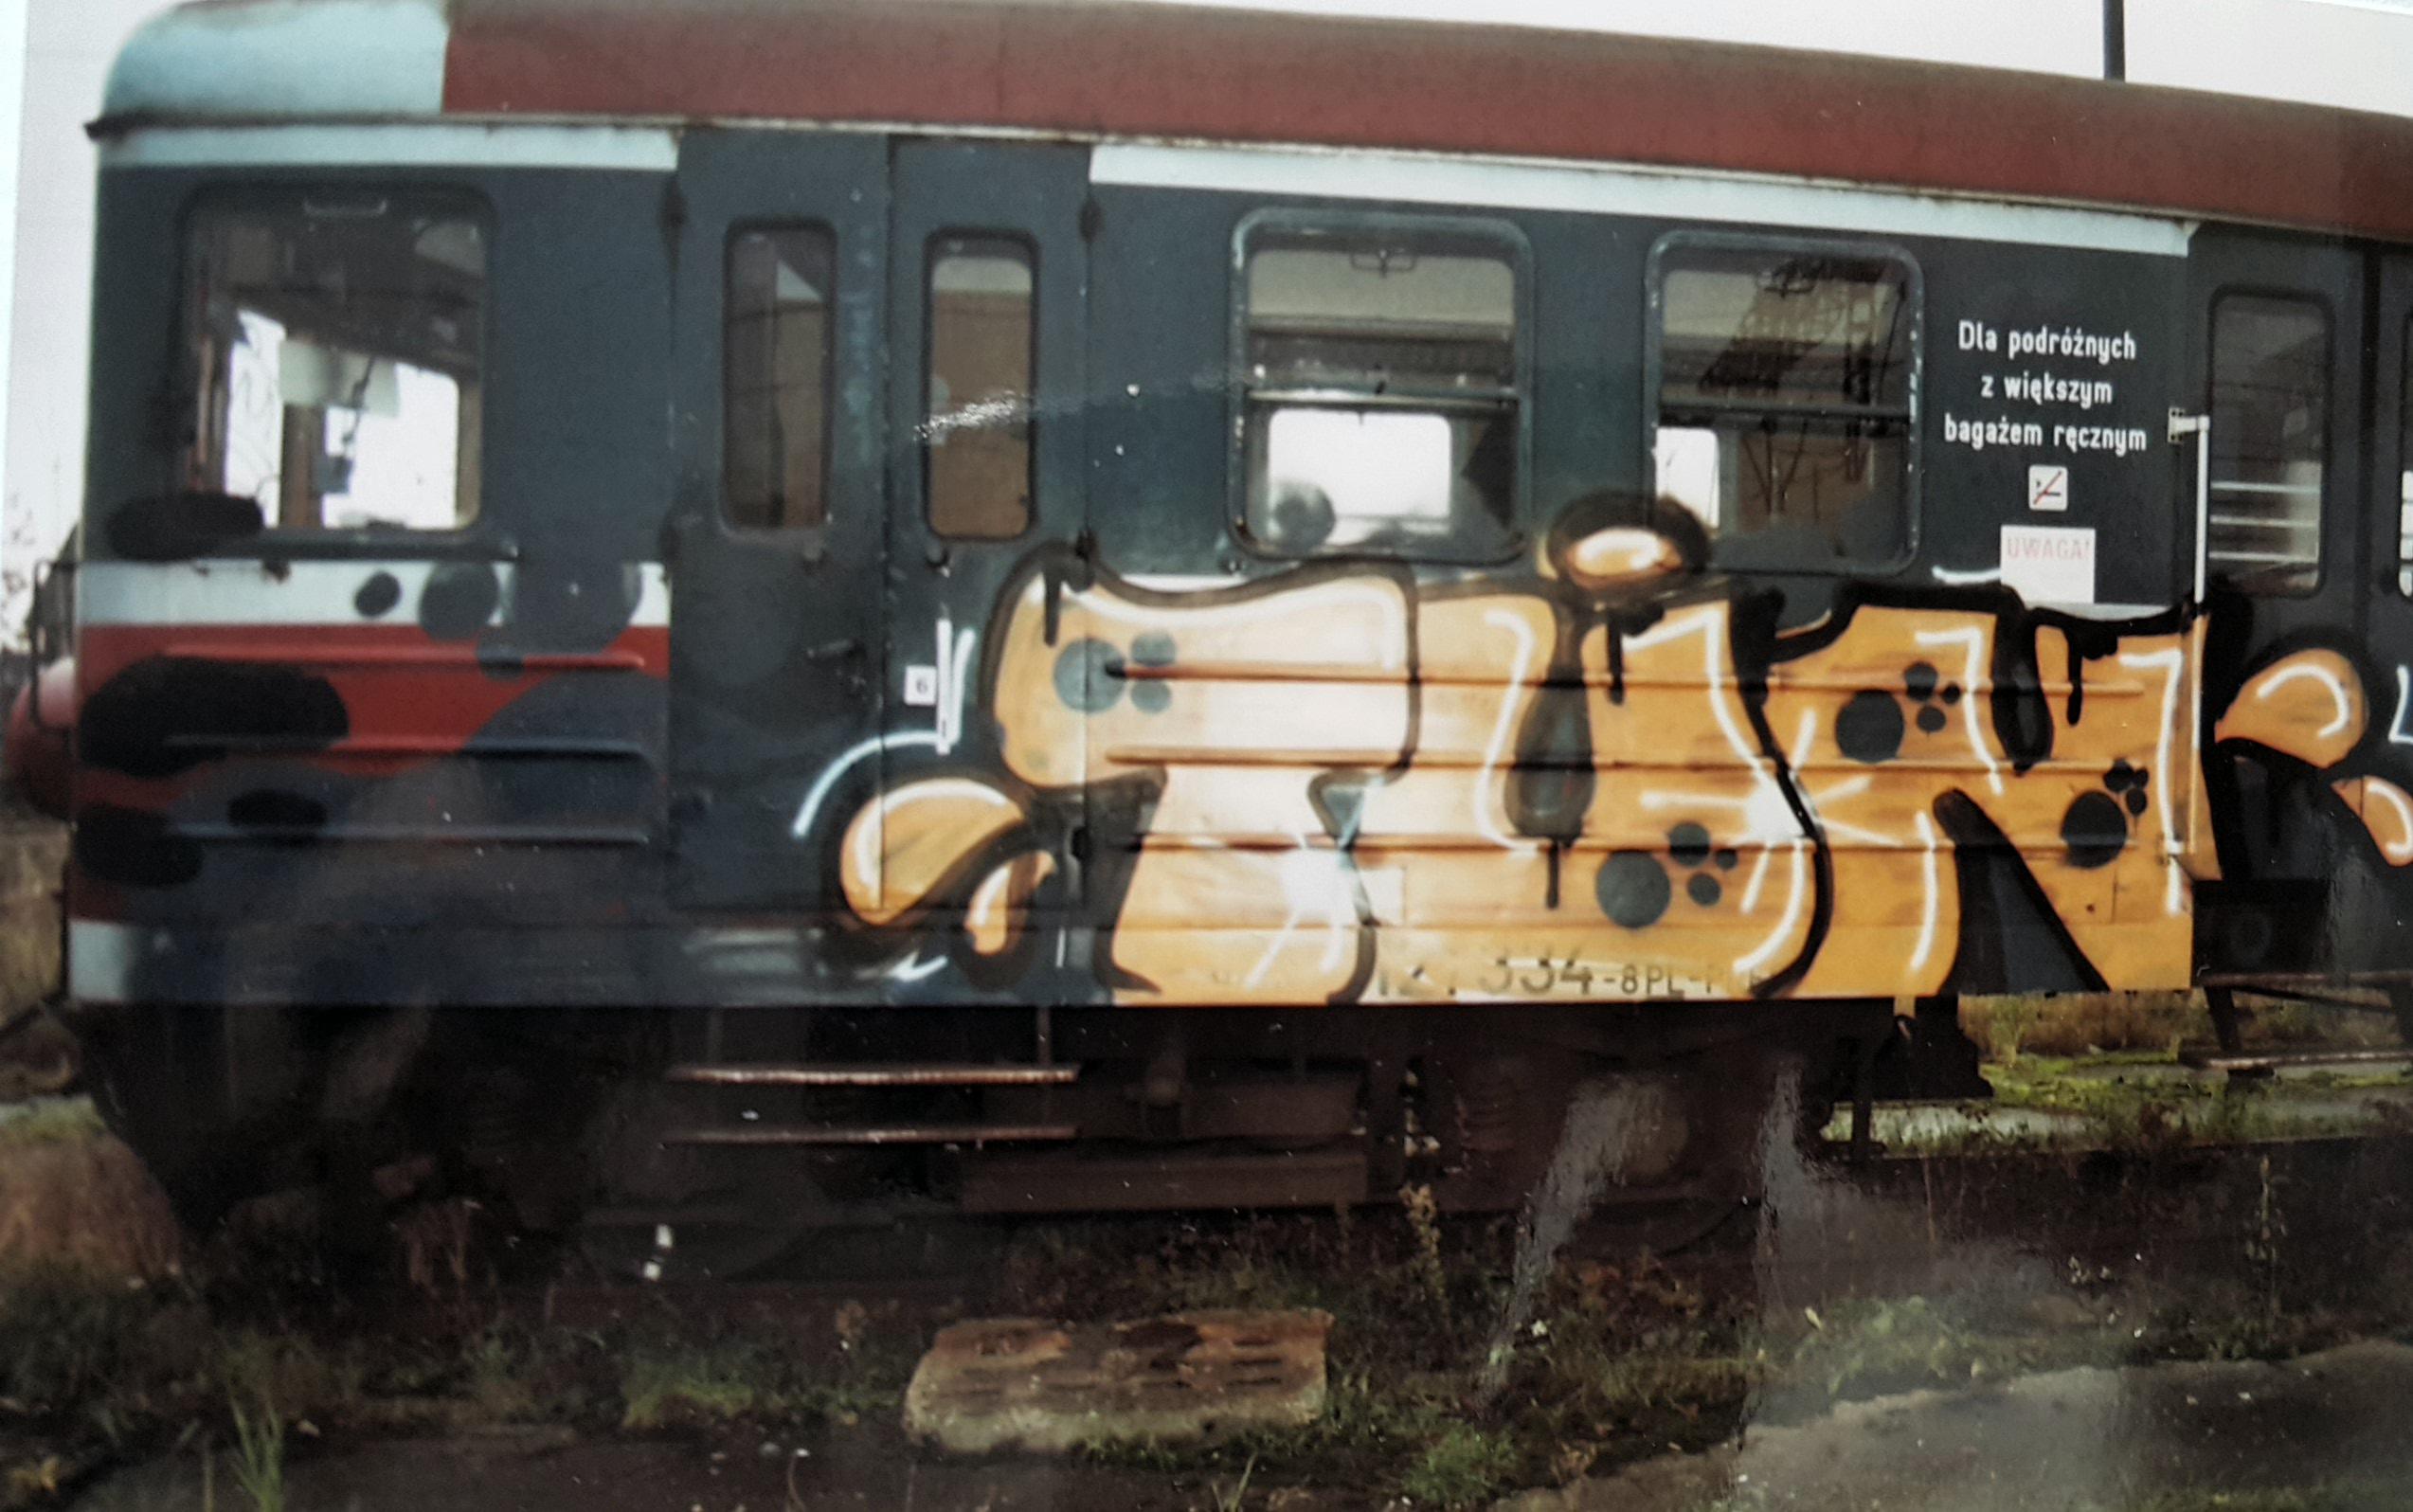 https://m.wm.pl/2018/03/orig/graffiti-podejrzanego-1-451943.jpg